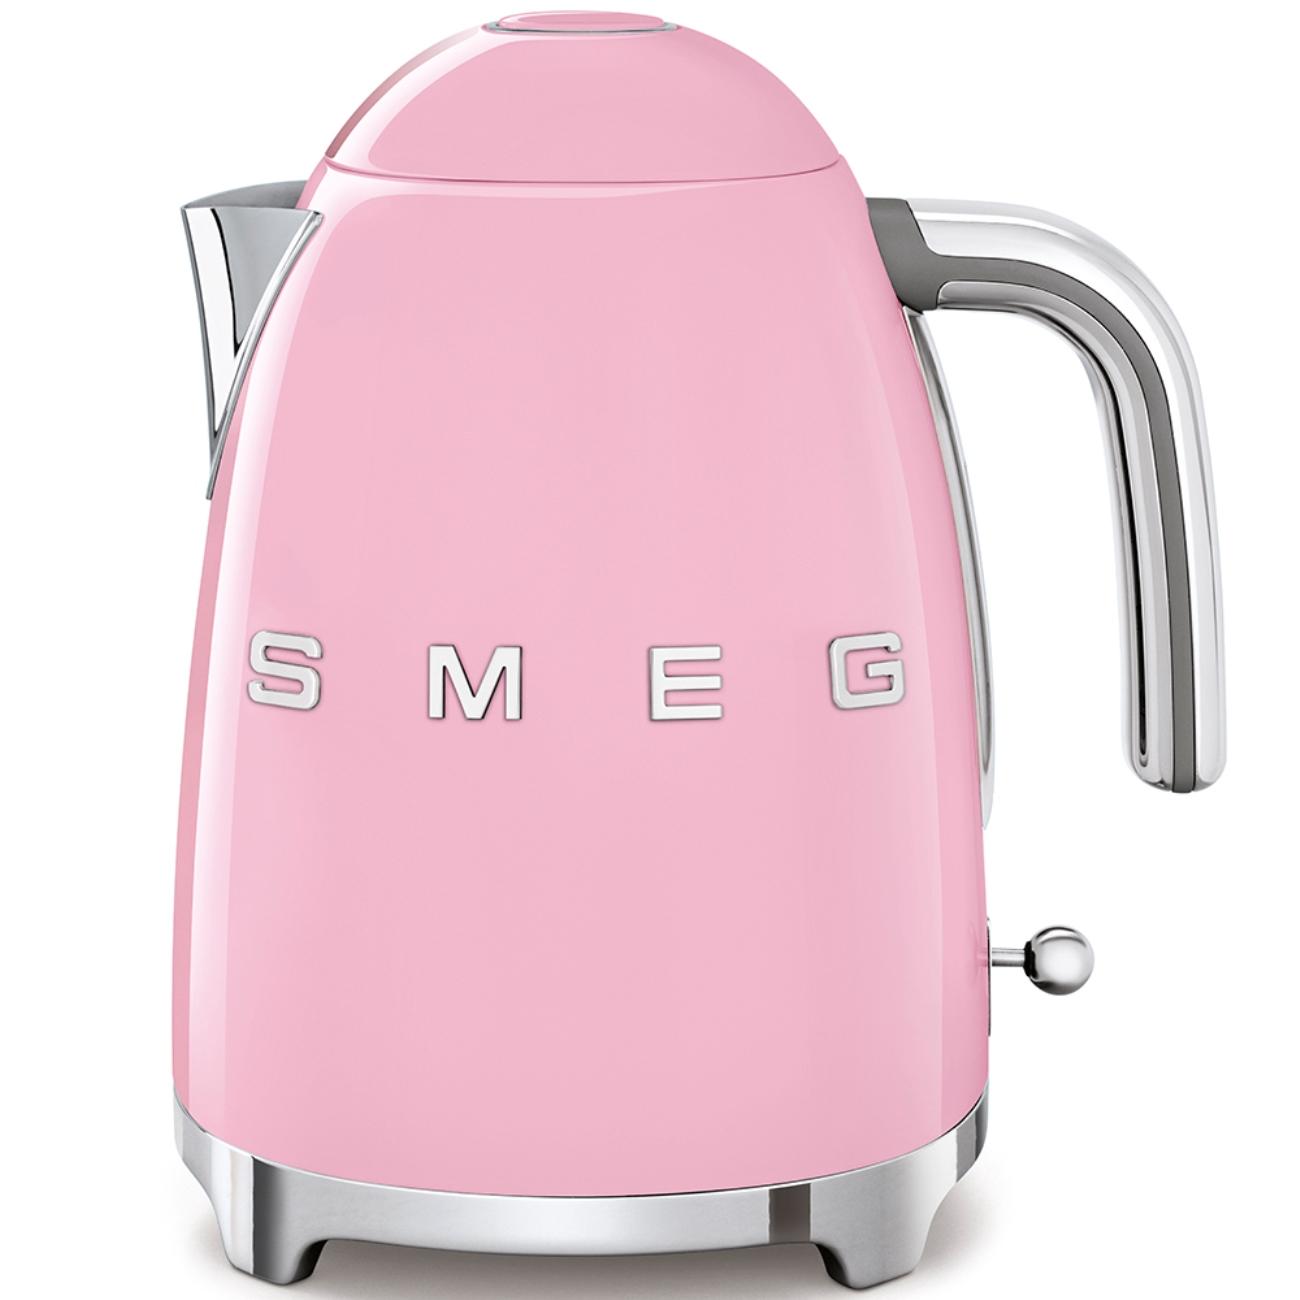 Онлайн каталог PROMENU: Чайник электрический Smeg 50 Style, объем 1,7 л, розовый                               KLF03PKEU